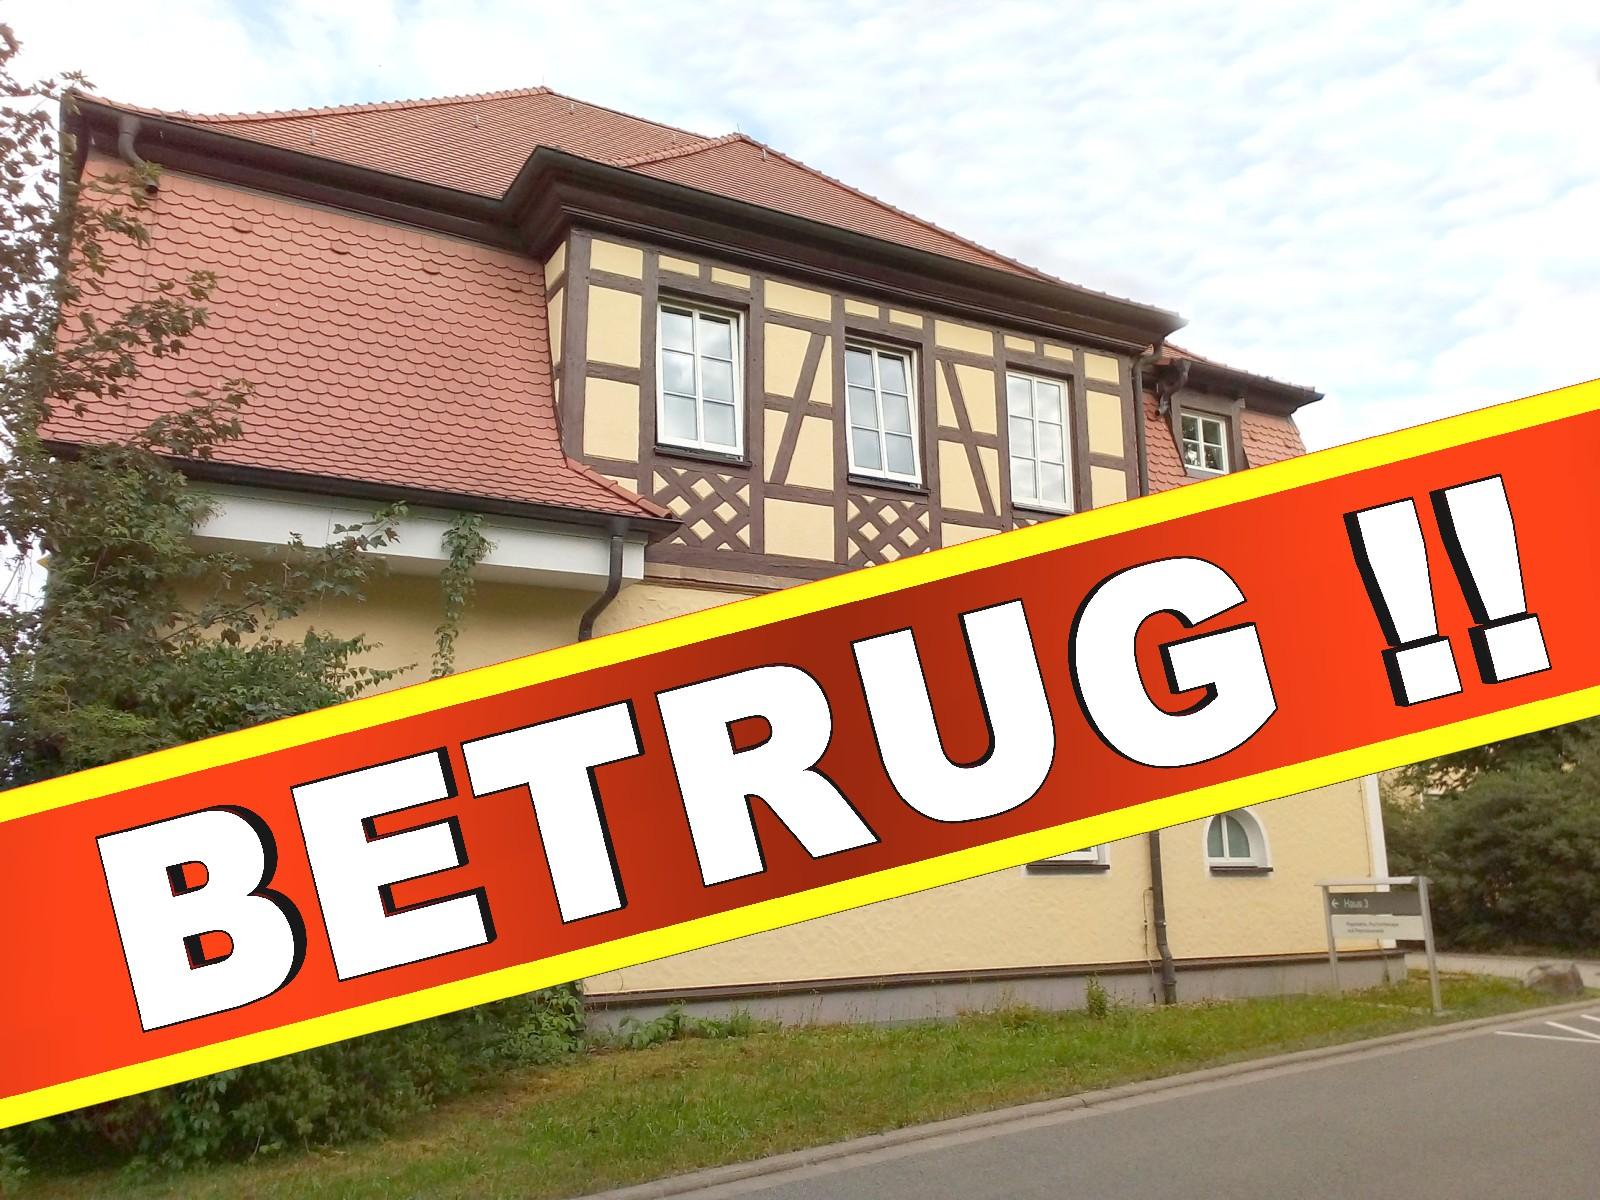 Bezirksklinikum Obermain Kutzenberg, 96250 Ebensfeld Psychiatrie Polizei Krankenhaus (51)